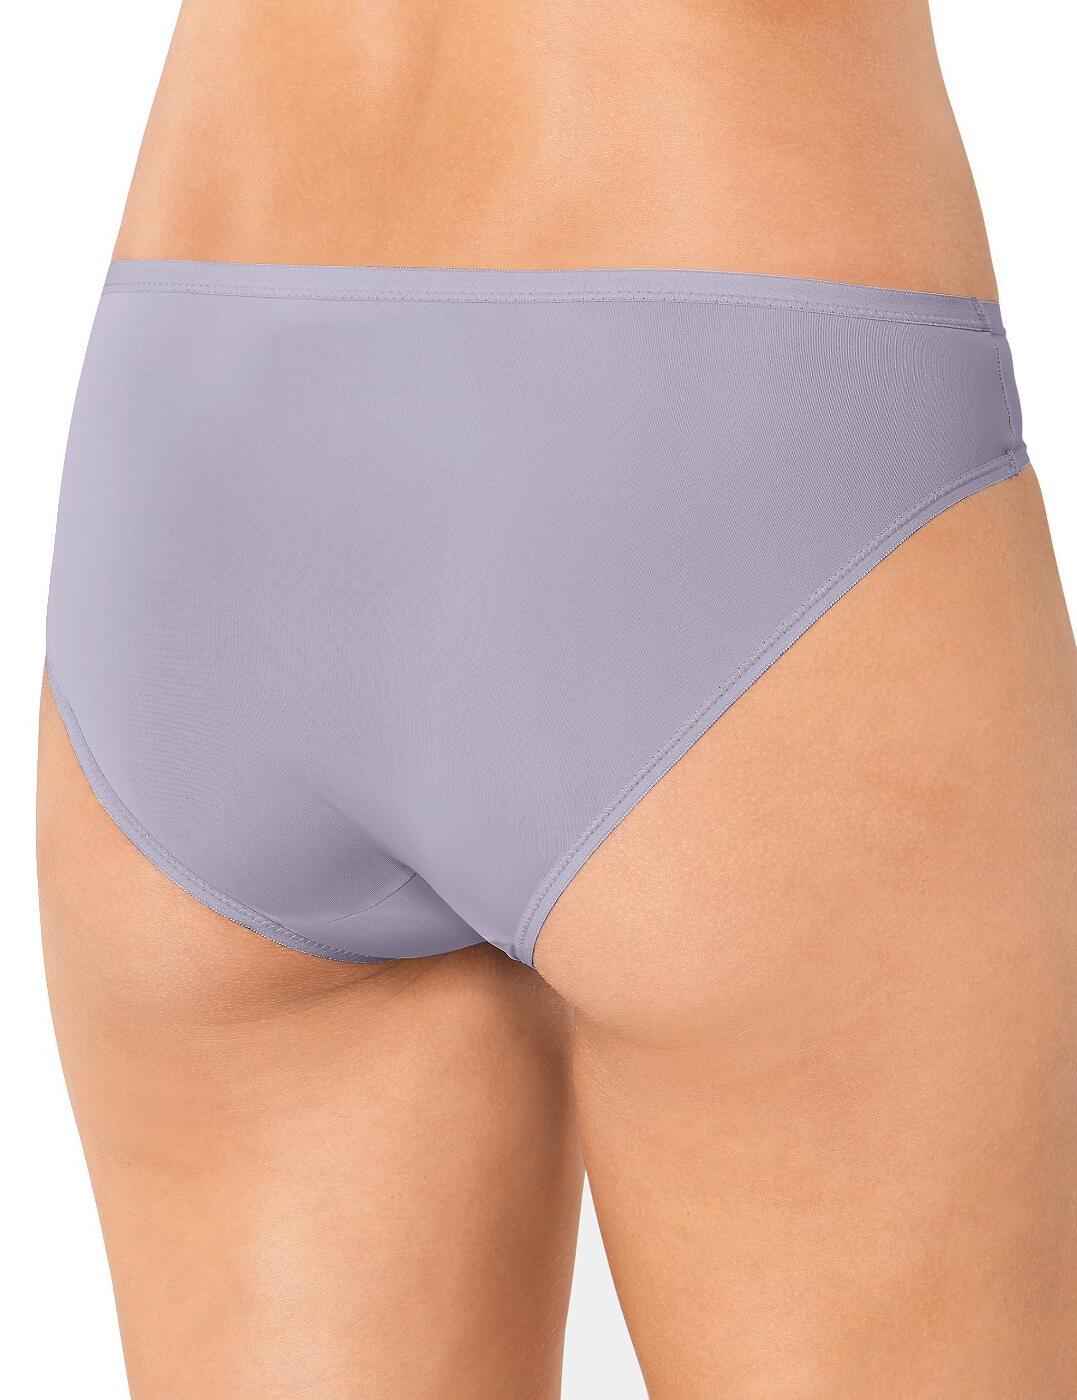 Sloggi Women/'s Wow Comfort Tai Briefs Knickers 10167121 RRP £8